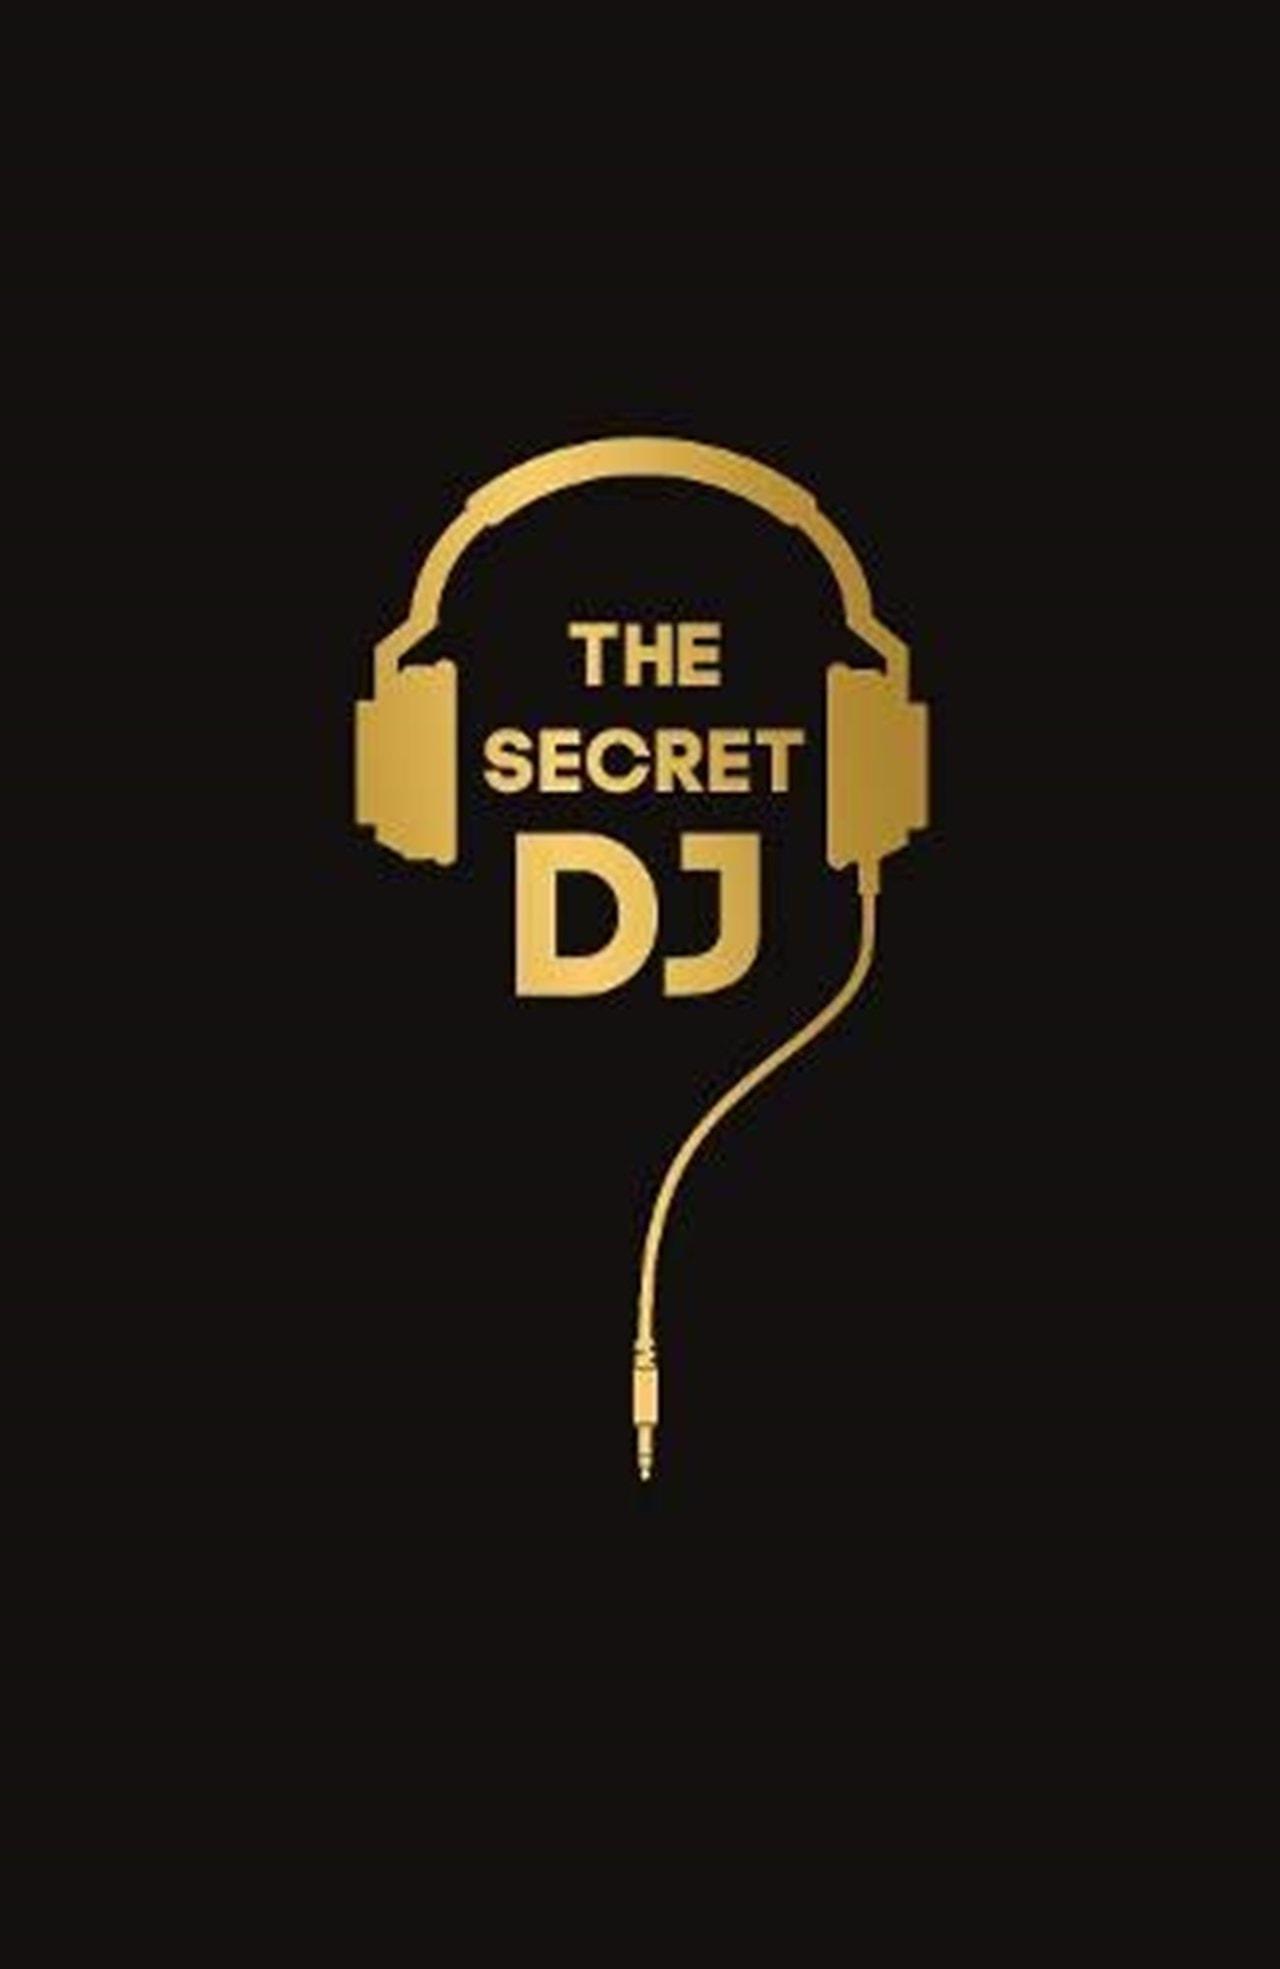 The Secret DJ - 1